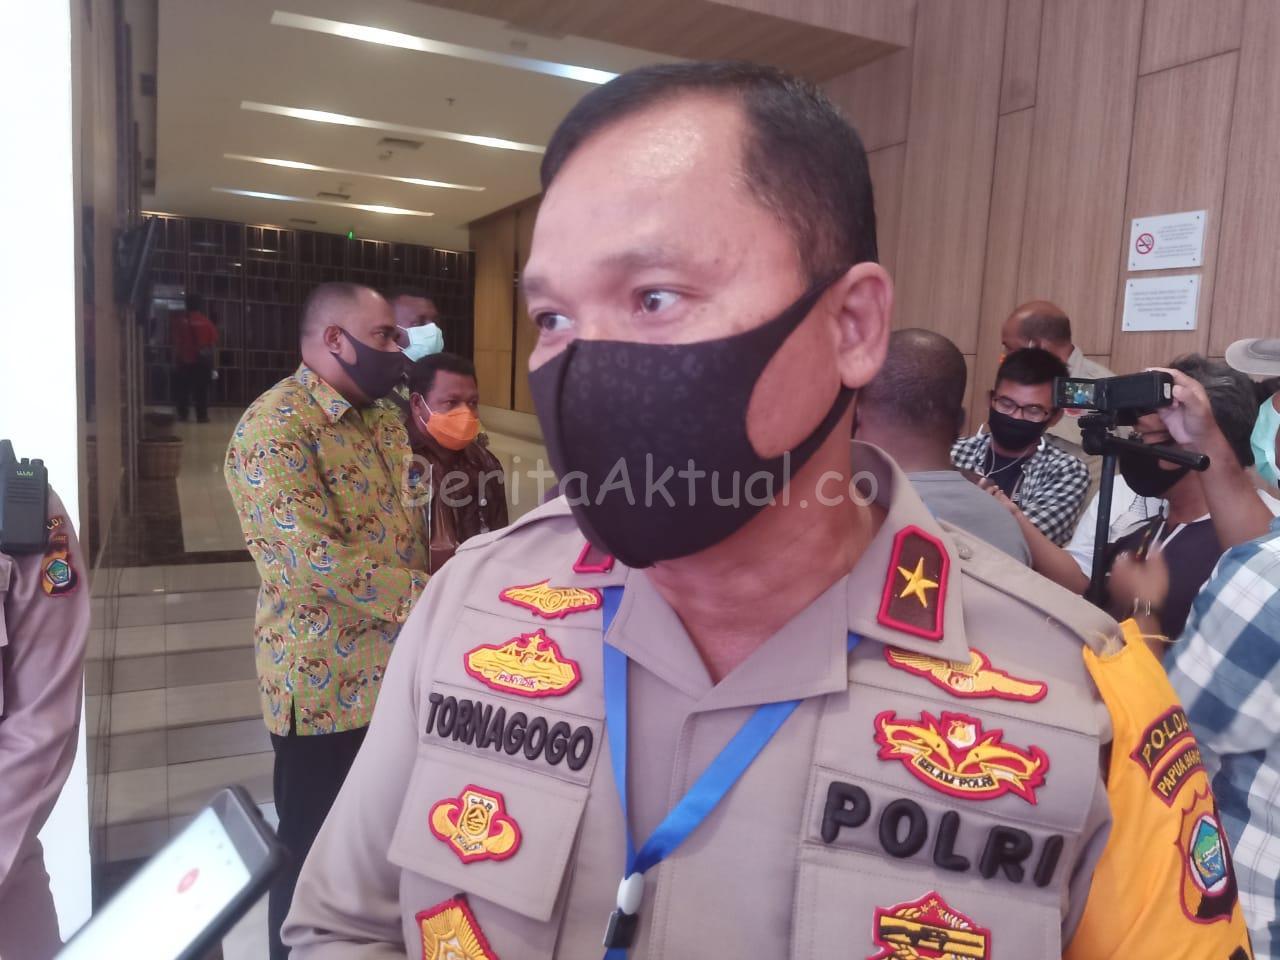 Polda PB Bentuk Tim Khusus Kejar Pelaku Begal Dan Curas di Manokwari Dan Sorong 1 IMG 20200424 WA0044